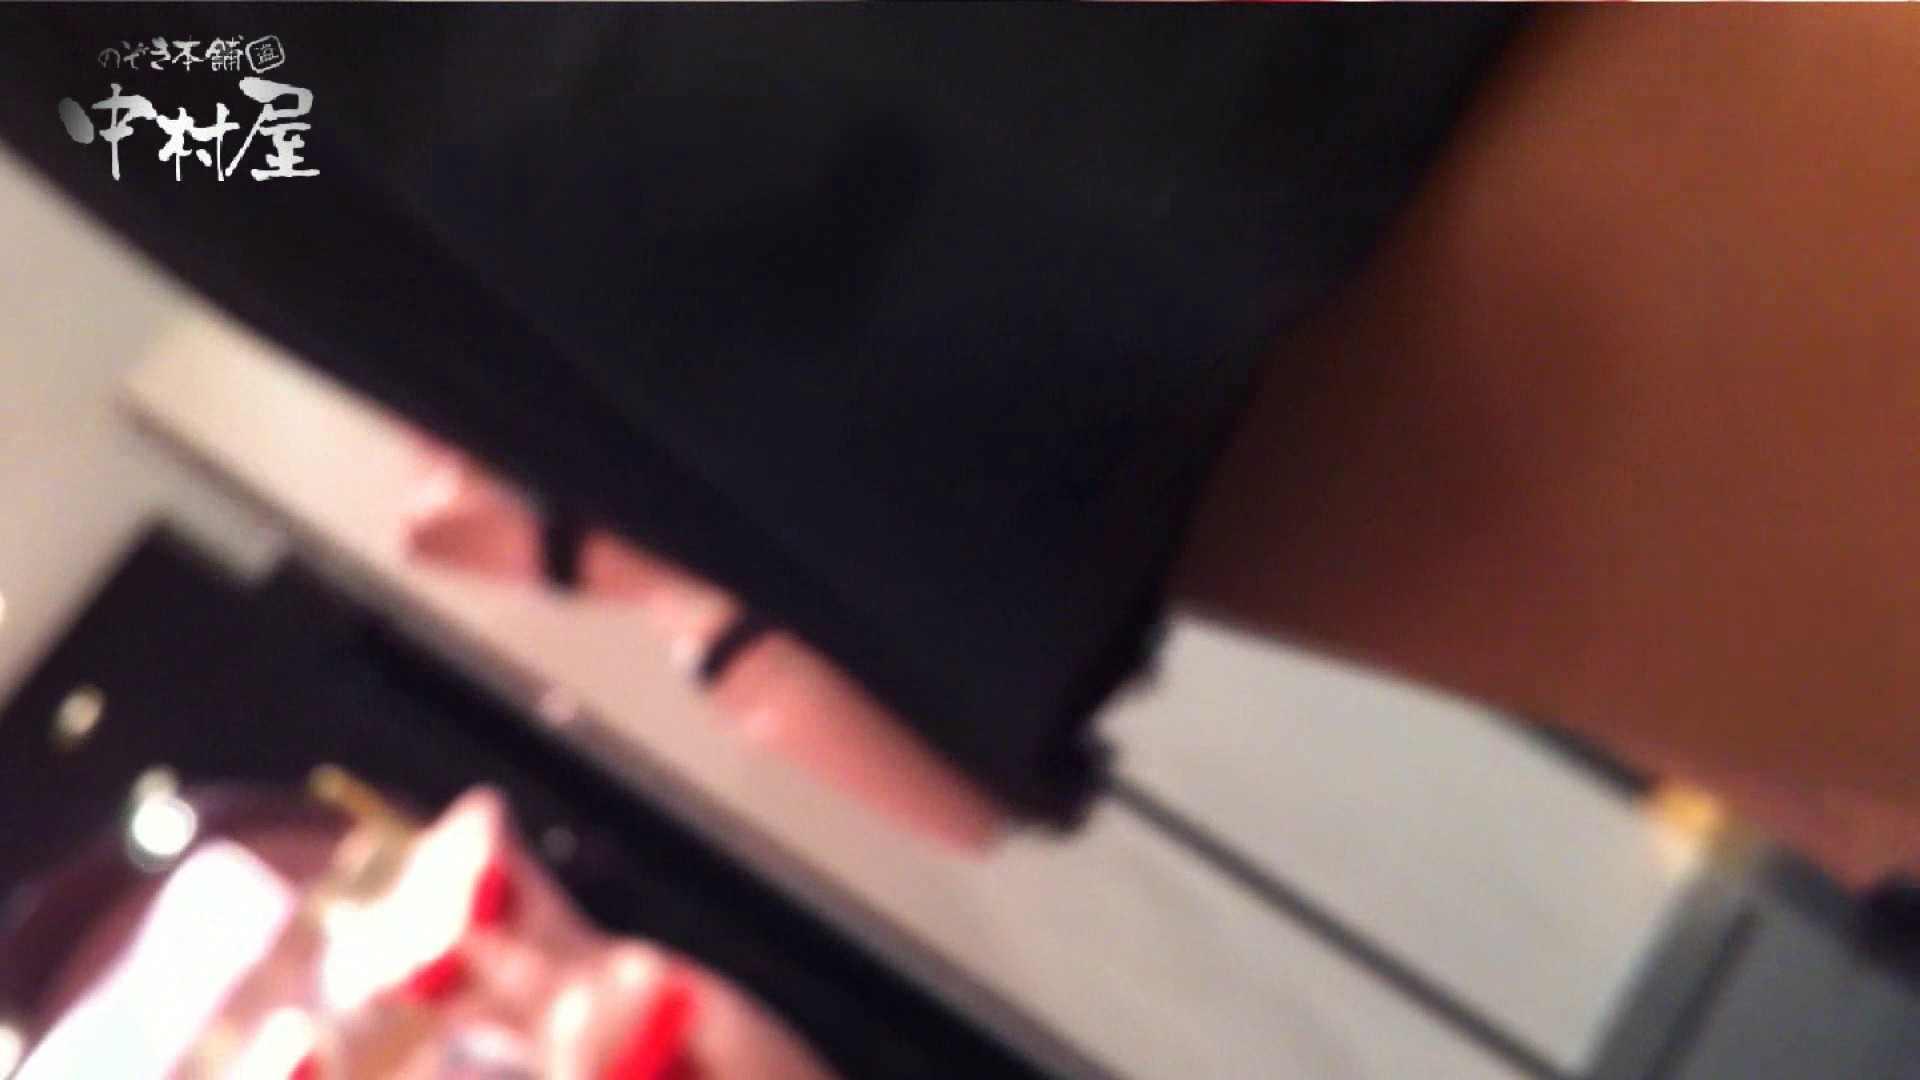 vol.47 カリスマ店員胸チラ&パンチラ 黒パン店員さん 接写 盗撮おめこ無修正動画無料 87PICs 74